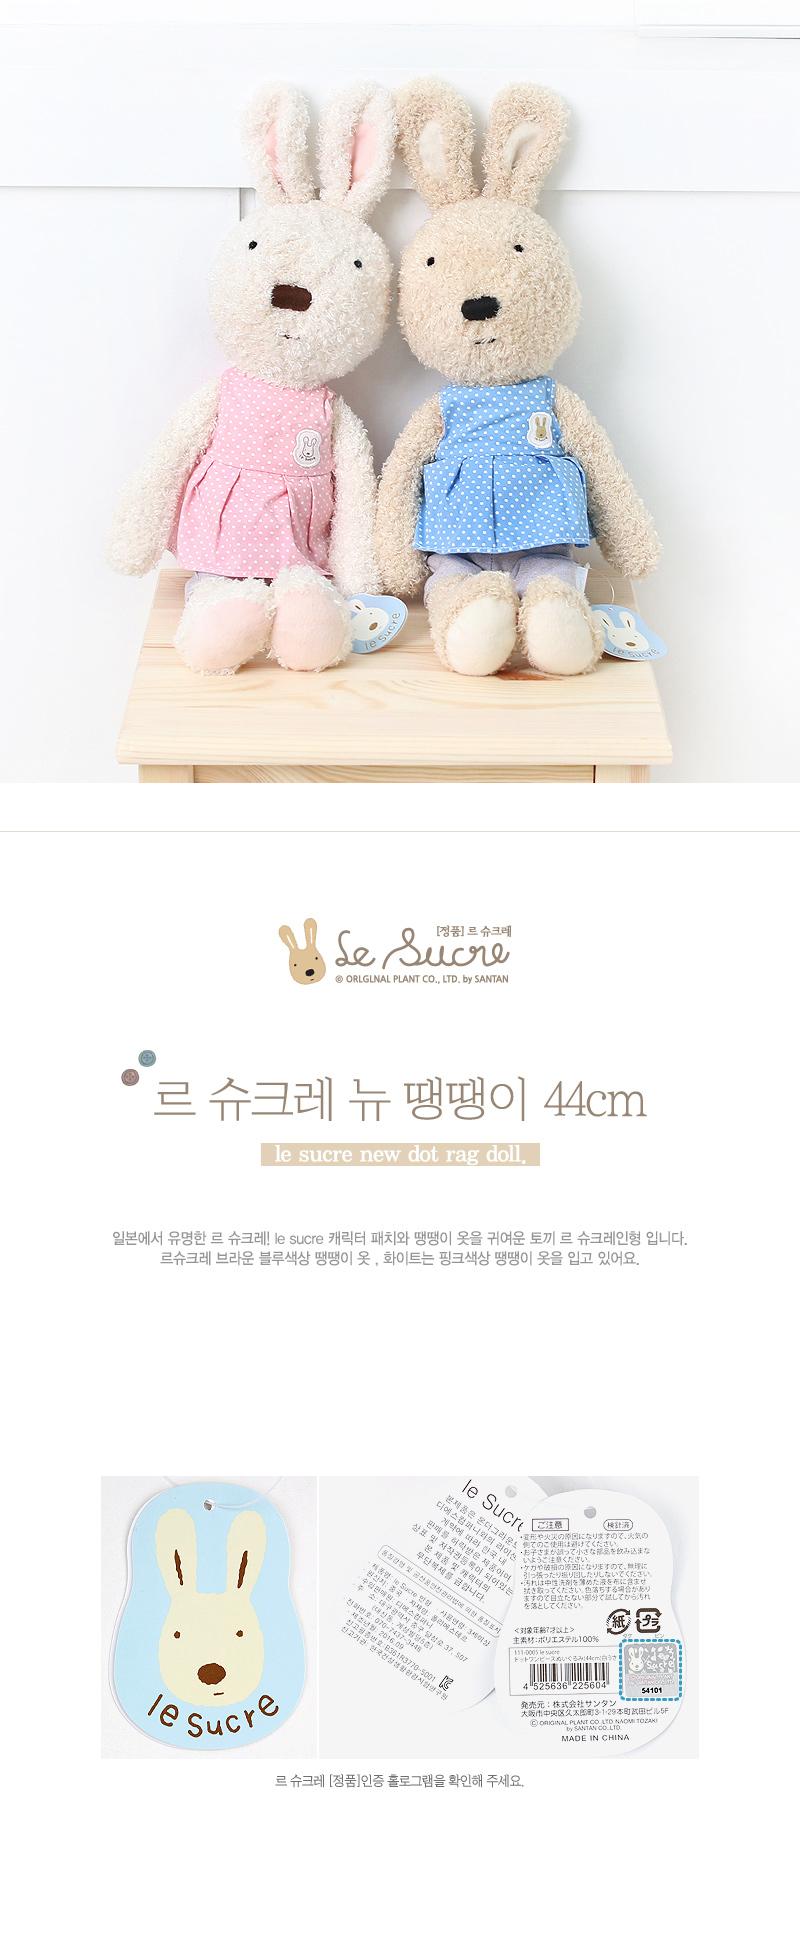 le sucre 르슈크레 뉴 땡땡이 인형-44cm (색상선택) - 누리토이즈, 34,020원, 애니멀인형, 토끼 인형